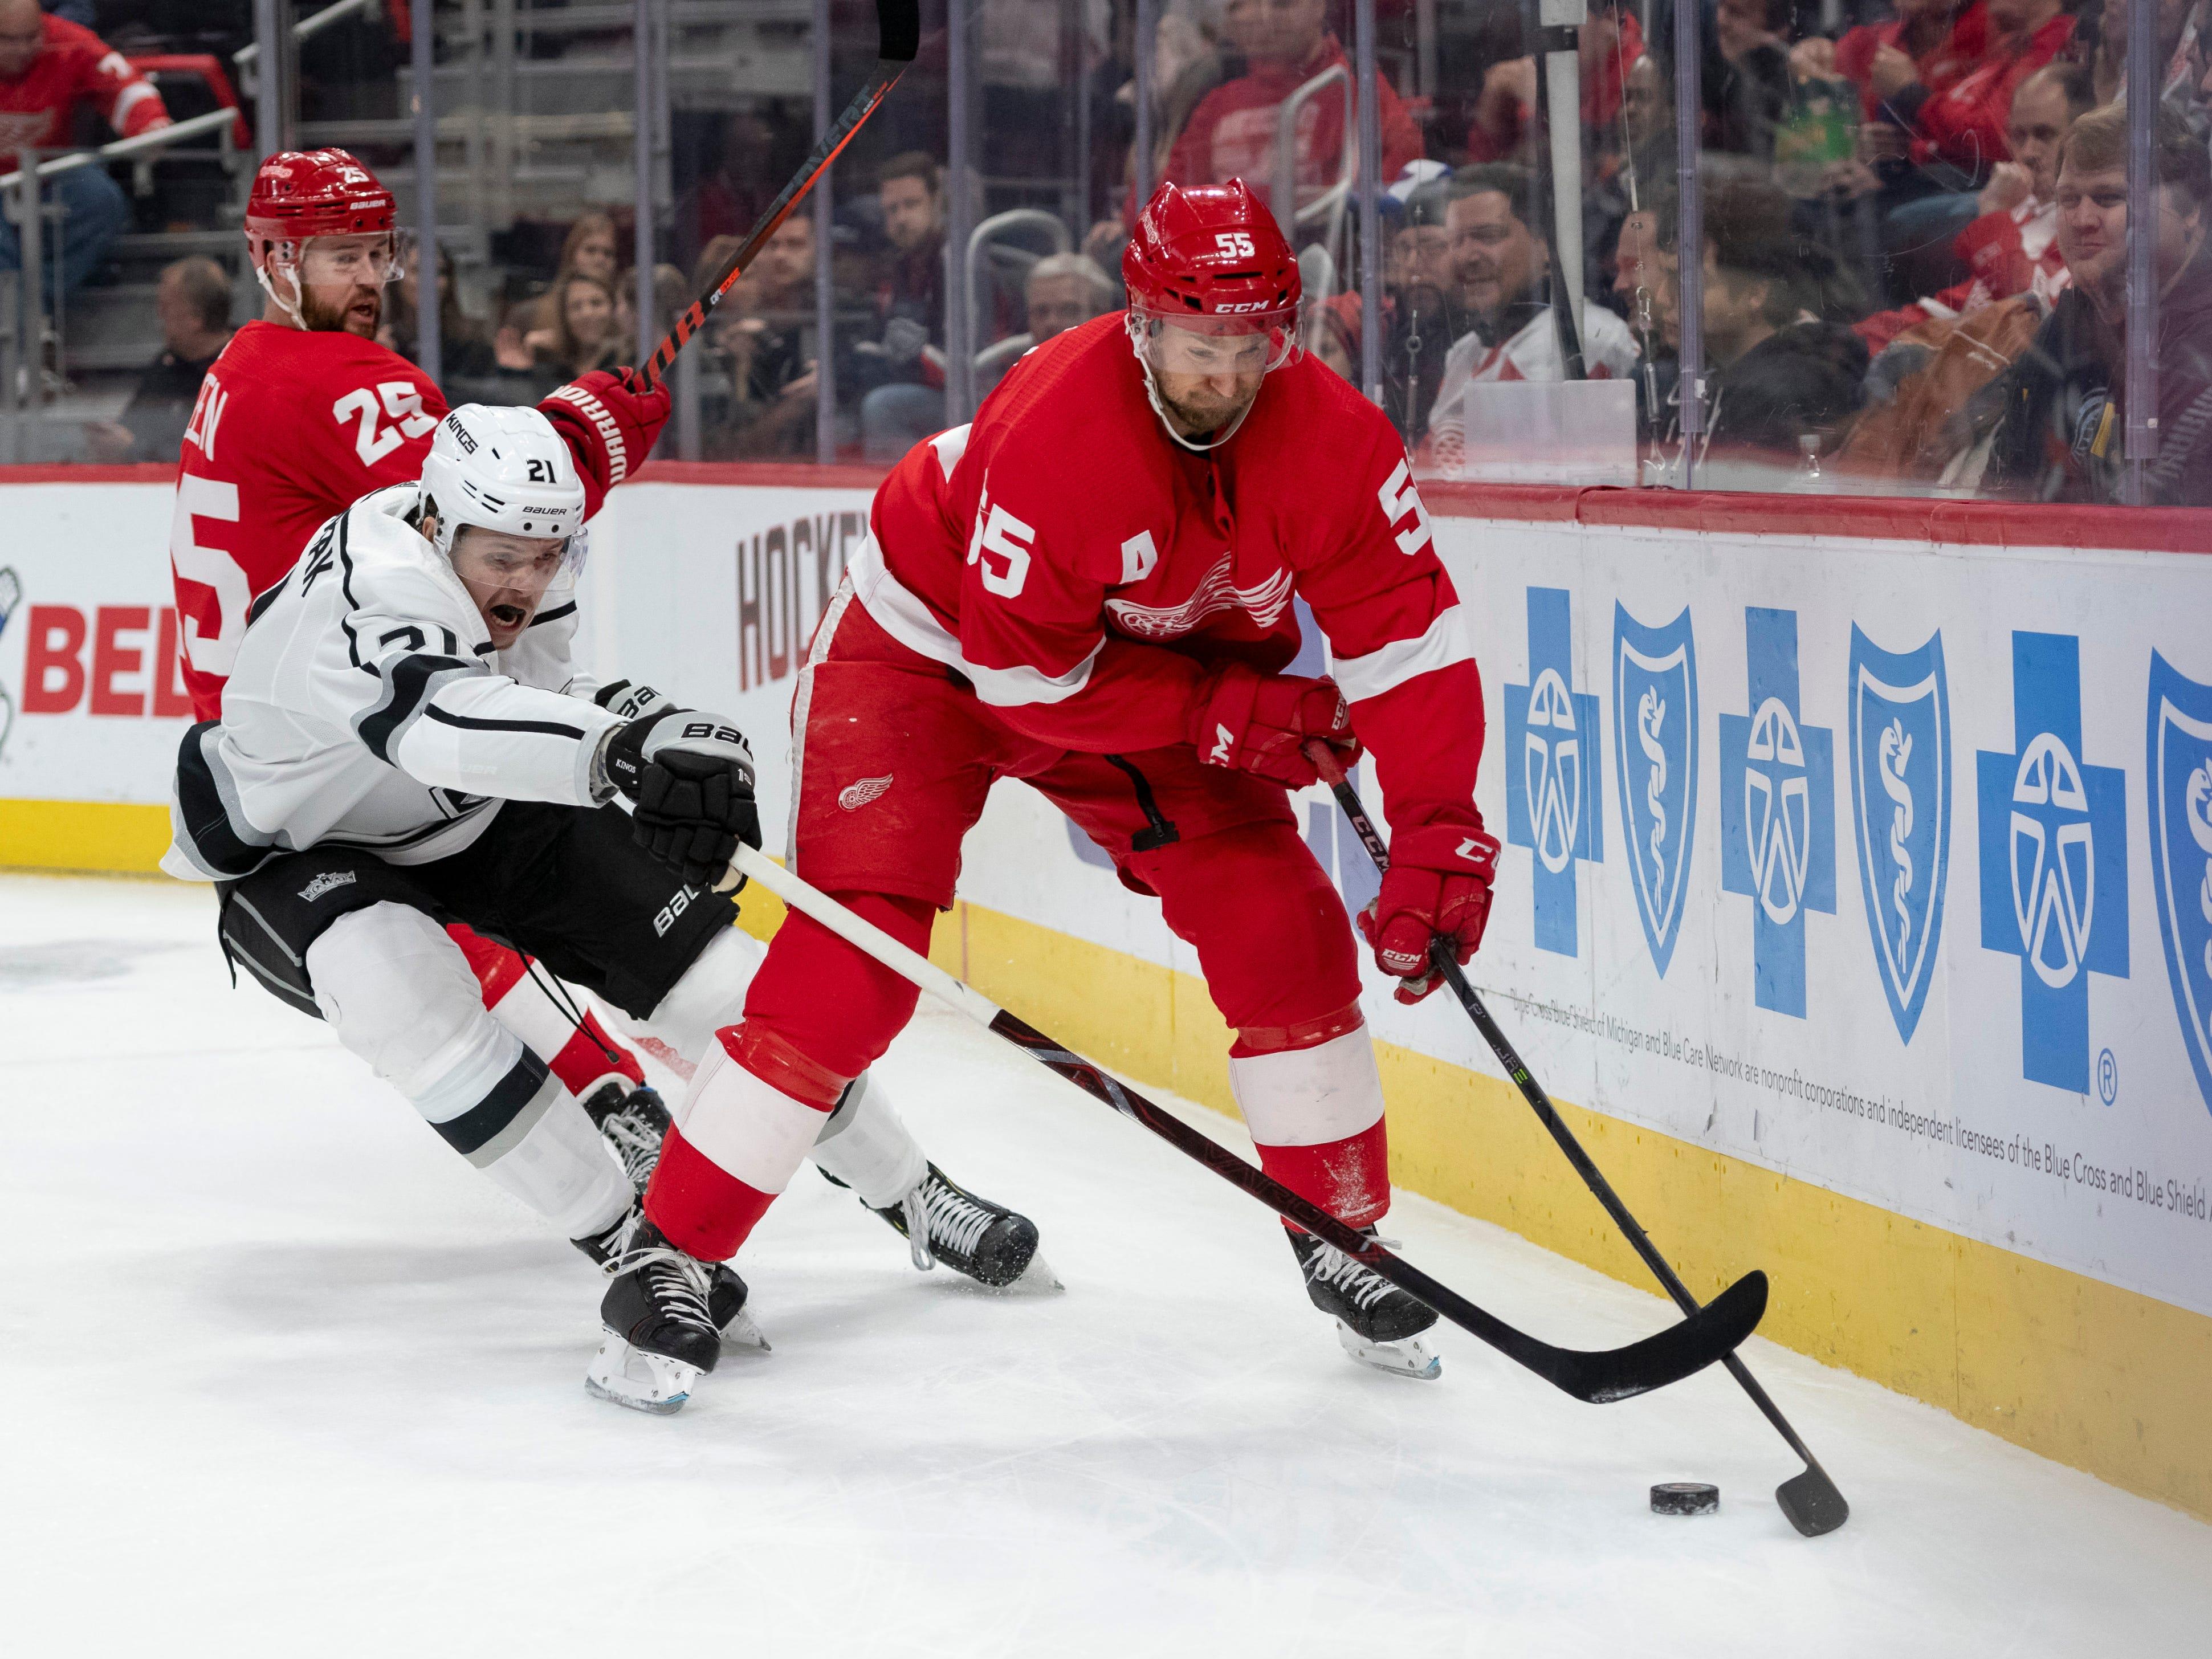 Detroit defenseman Niklas Kronwall keeps the puck away from Los Angeles left wing Nikita Scherbak in the second period.